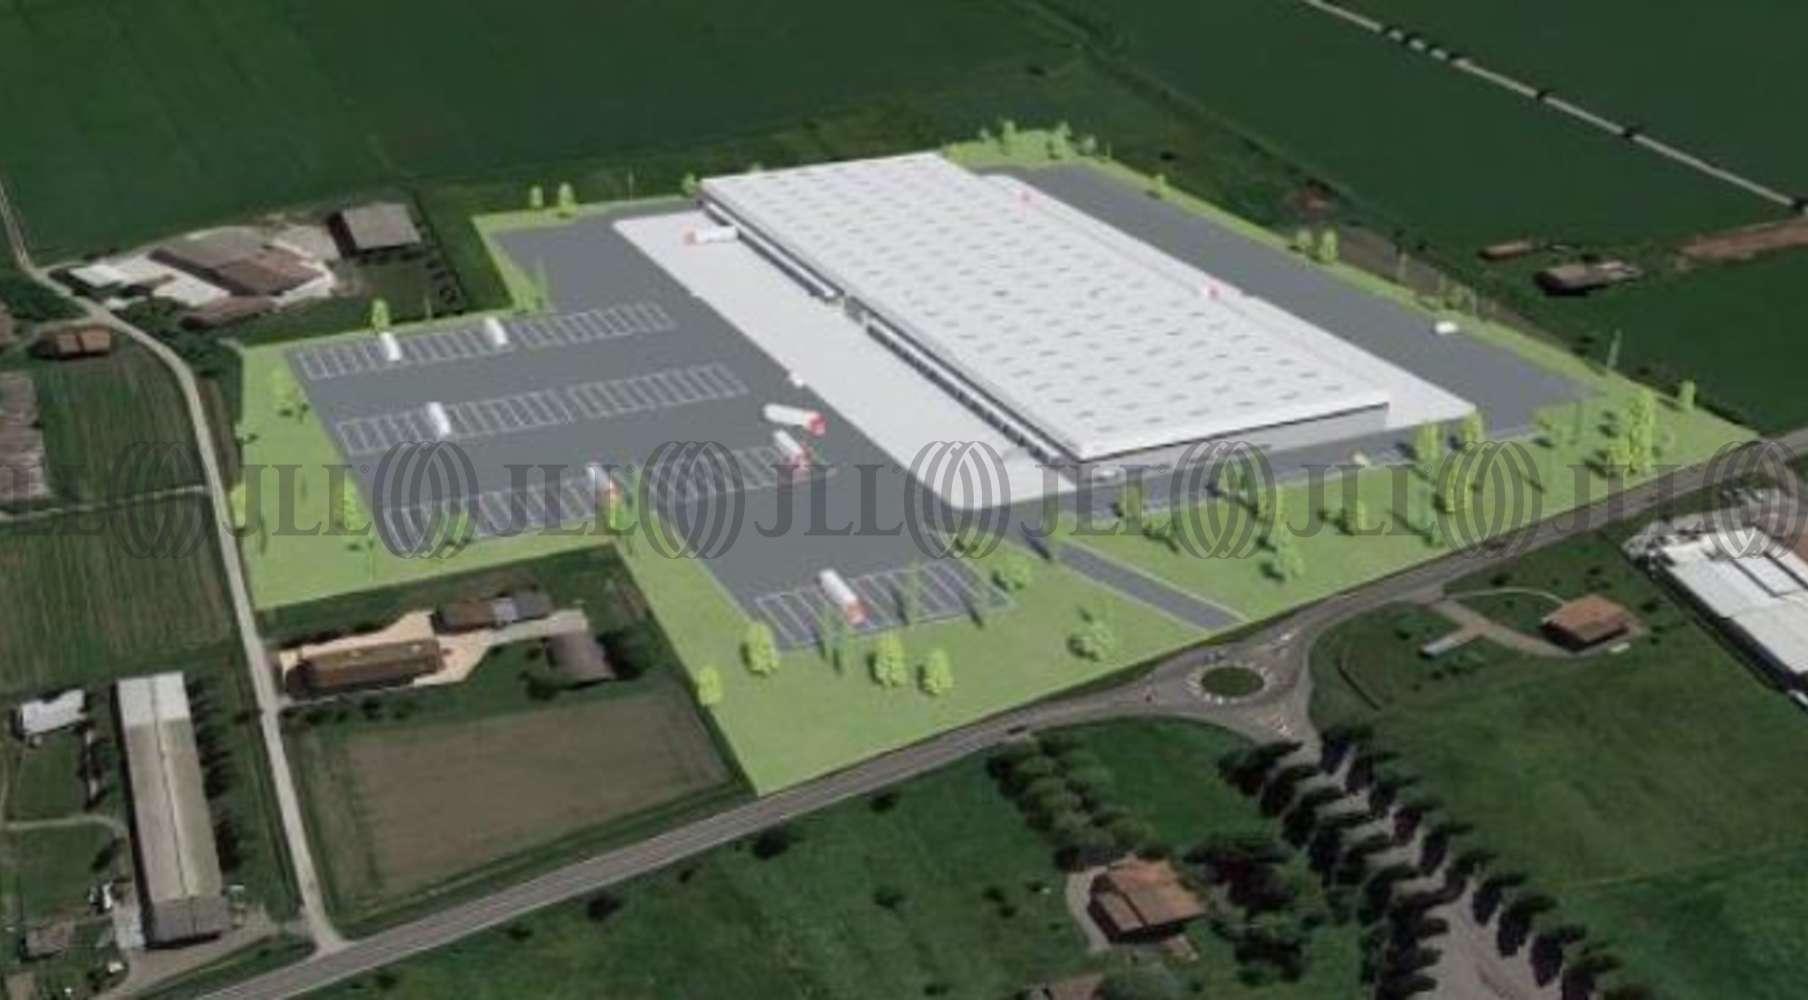 Magazzini industriali e logistici Campegine terre di canossa, 42040 - Campegine Terre di Canossa